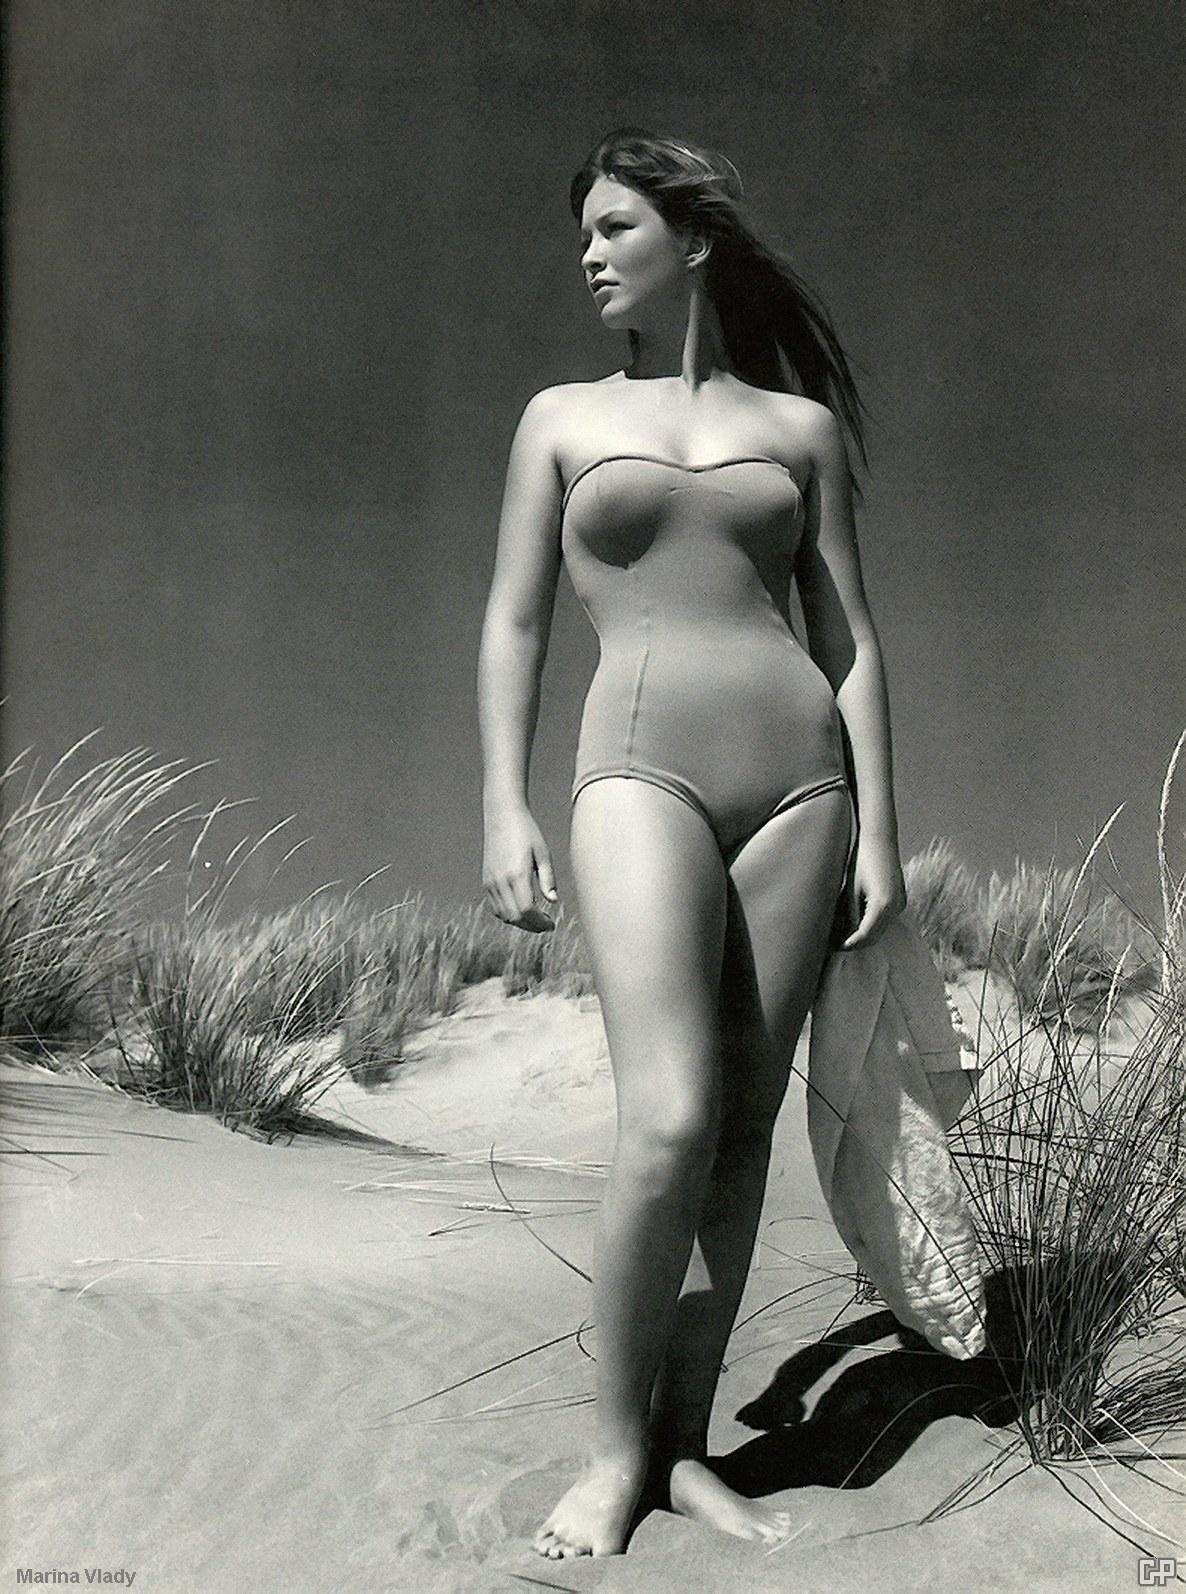 Marina Vlady at the beach (1960) http://t.co/eRfmCewyeI